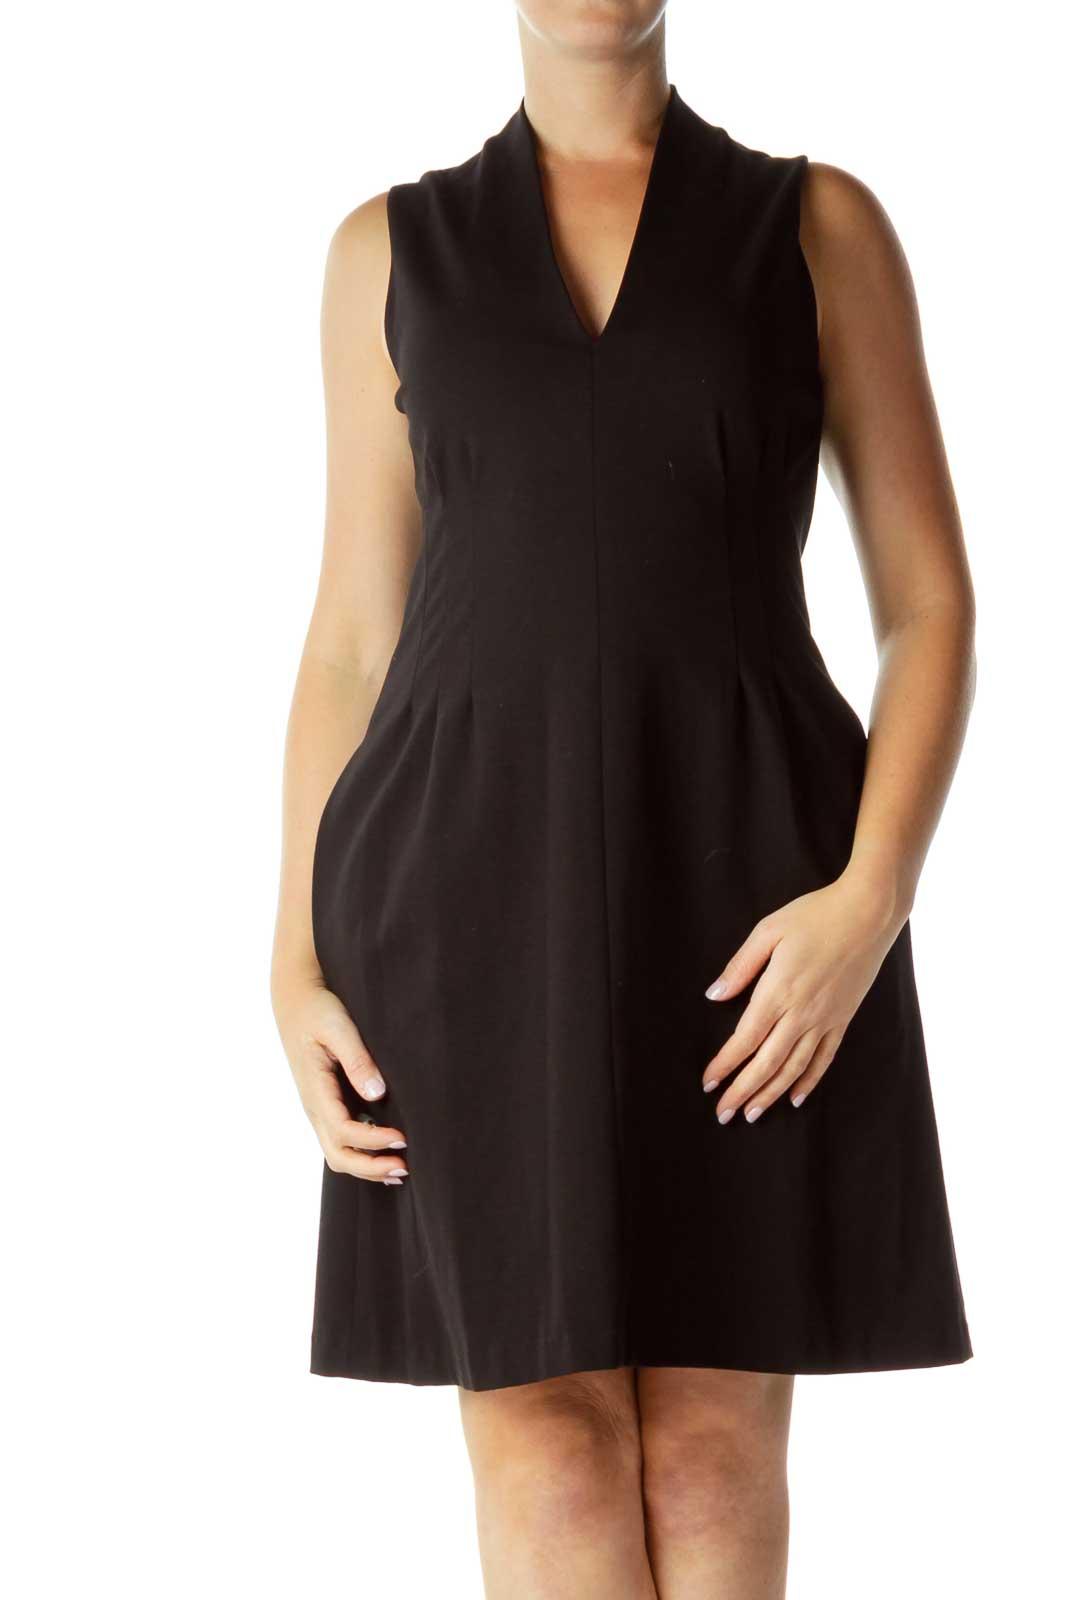 Black V-Neck Pleated Work Dress Front